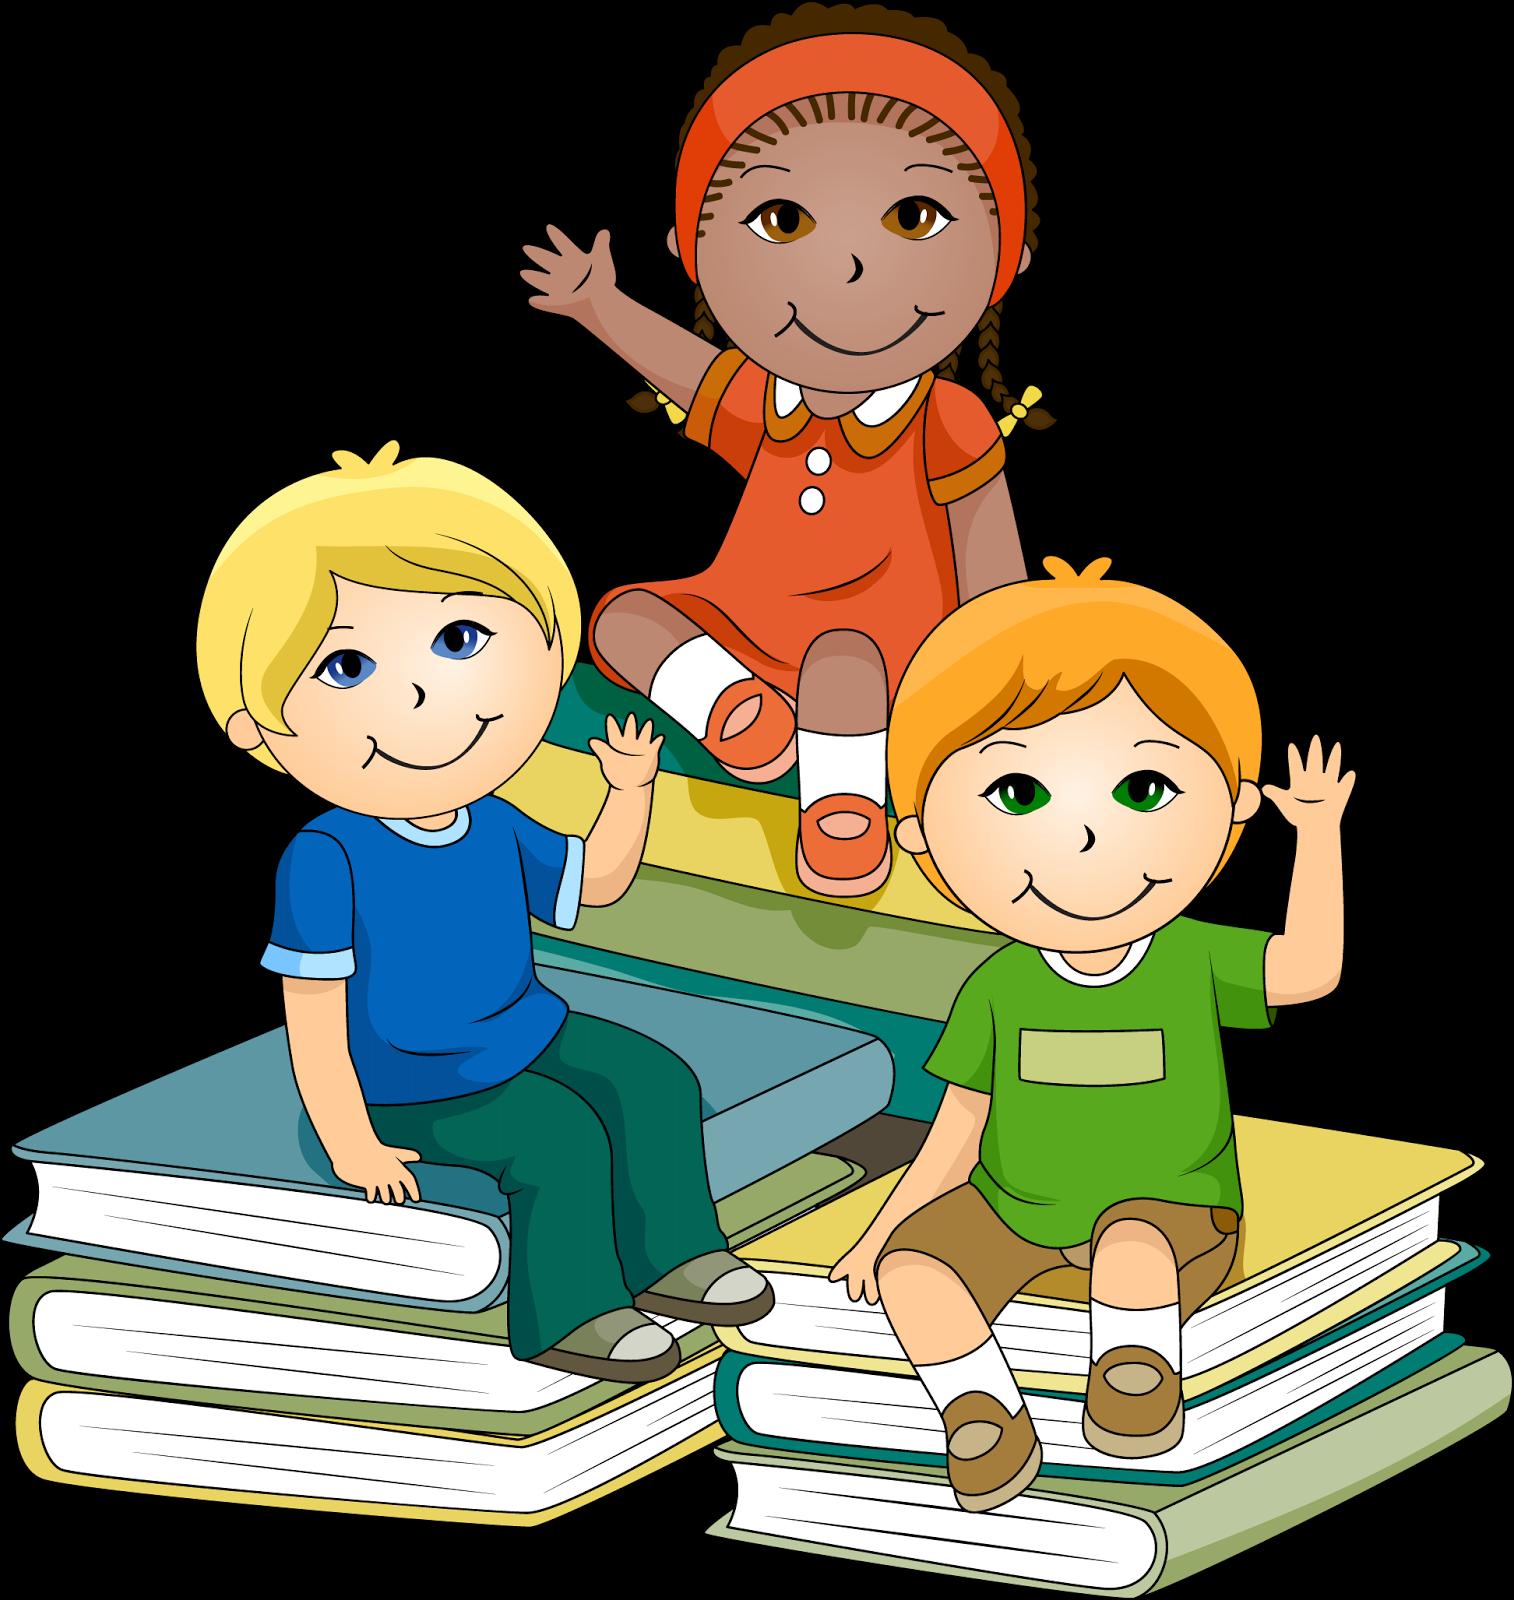 Children books that teach. Group clipart teacher